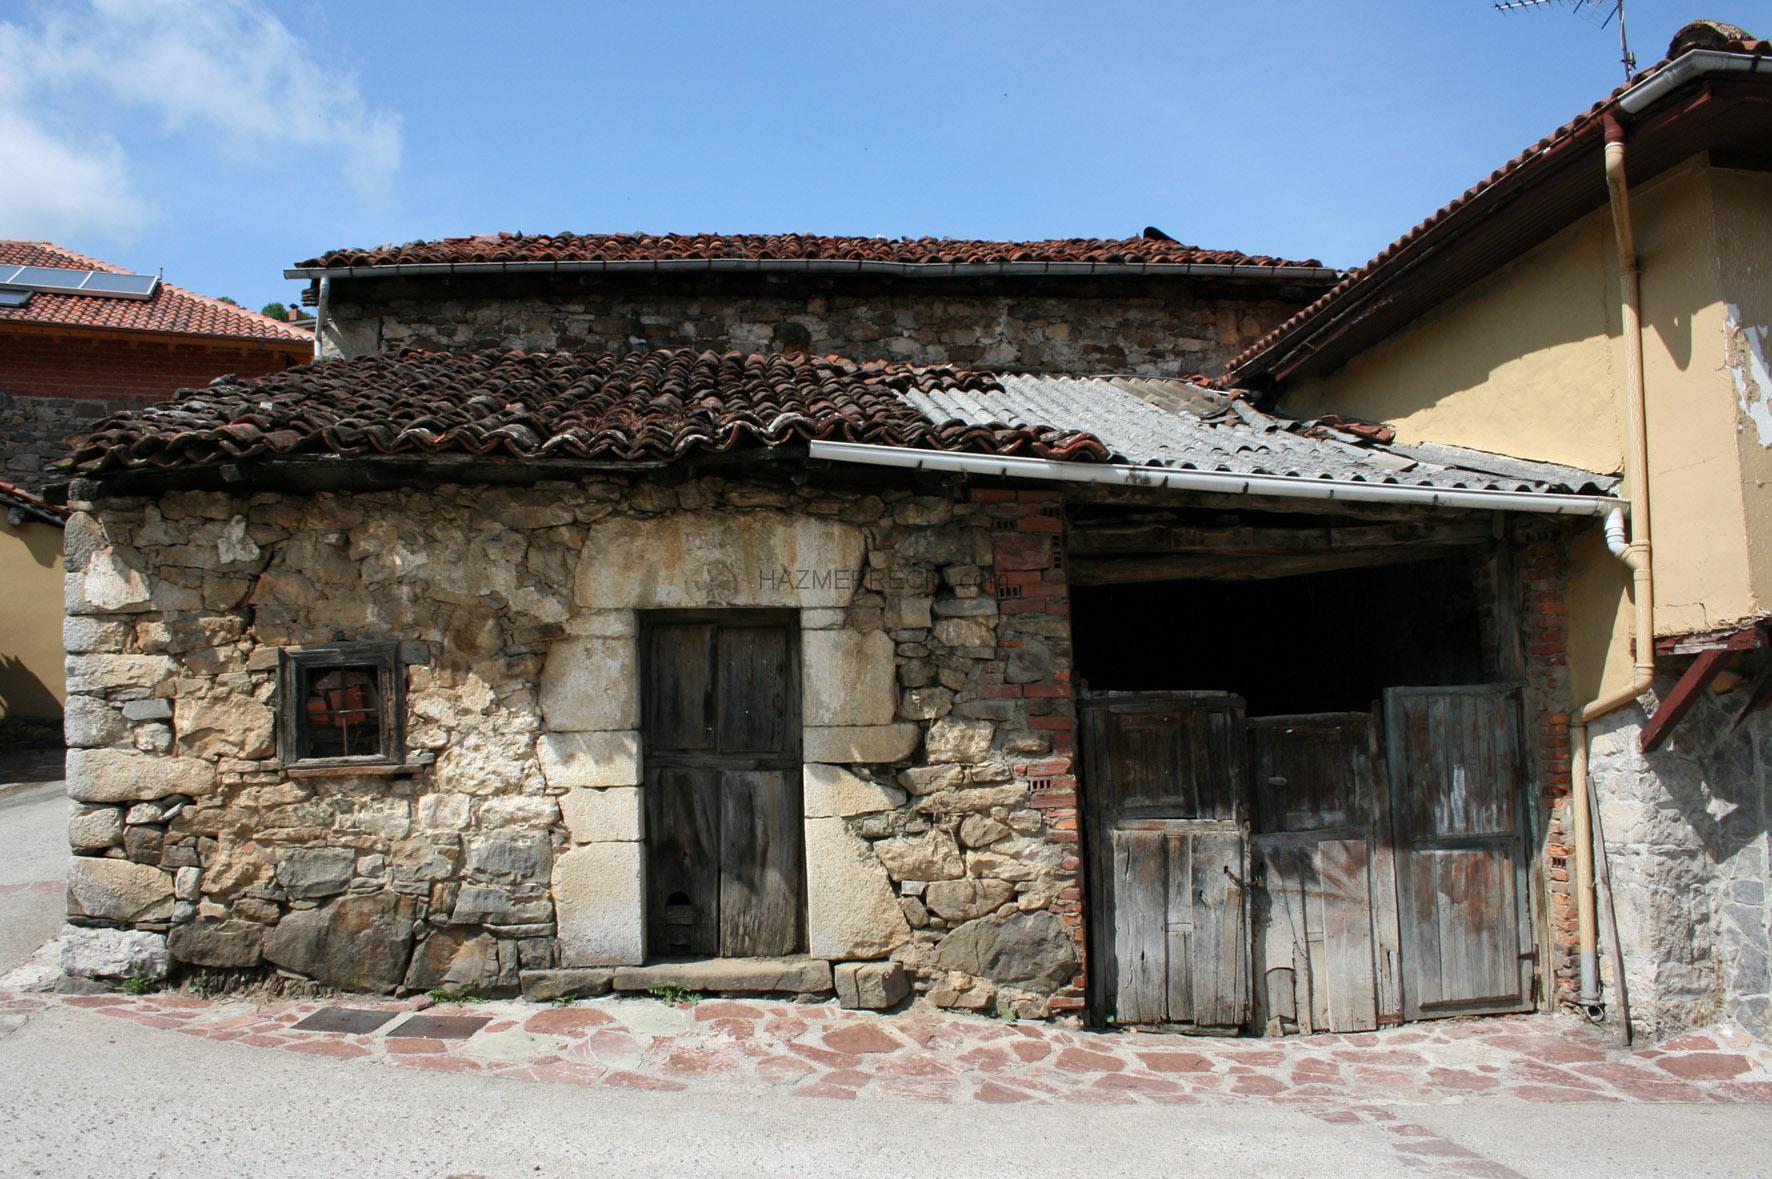 Rehabilitacion de casa de aldea parque nacional de redes - Rehabilitacion de casas antiguas ...